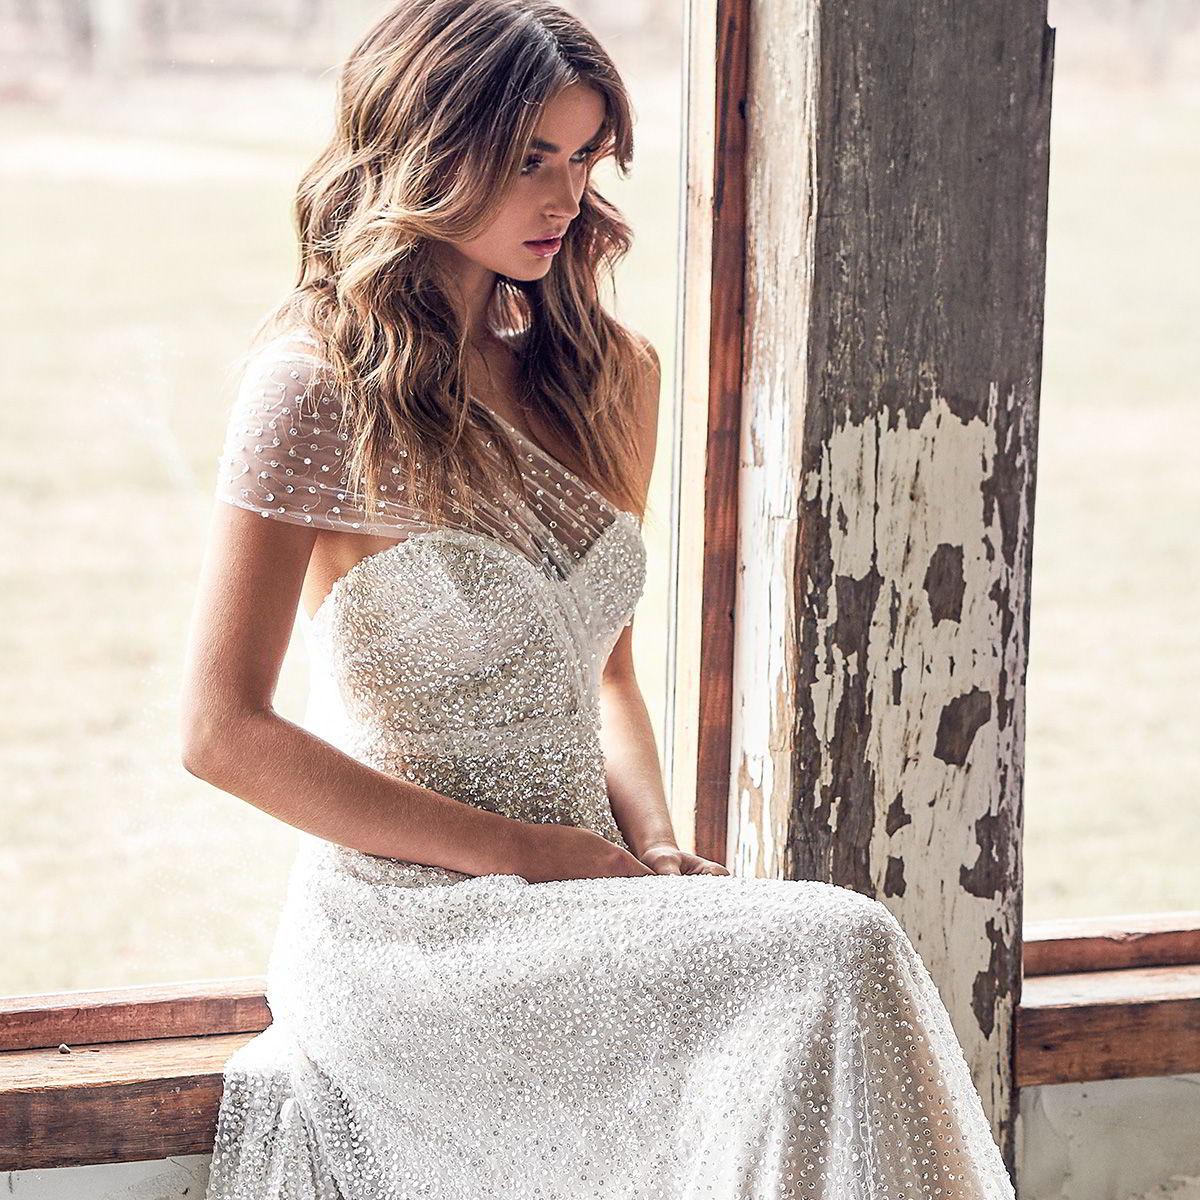 Anna Campbell 2019 Wedding Dresses: Anna Campbell 2020 Wedding Dresses